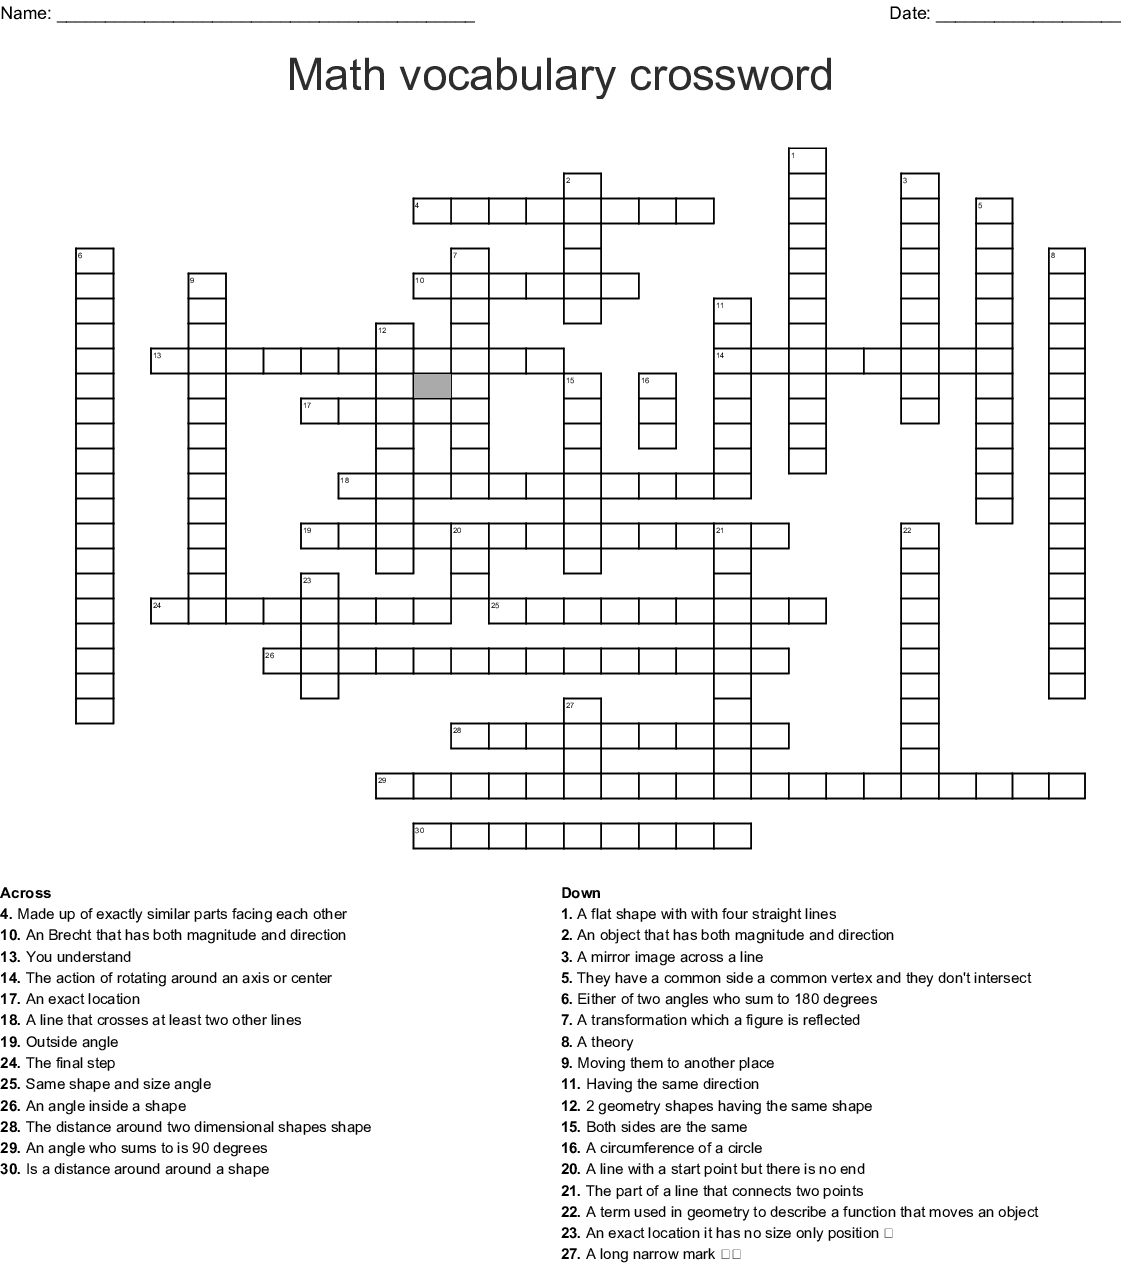 Math Vocabulary Crossword - Wordmint - Printable Math Vocabulary Crossword Puzzles